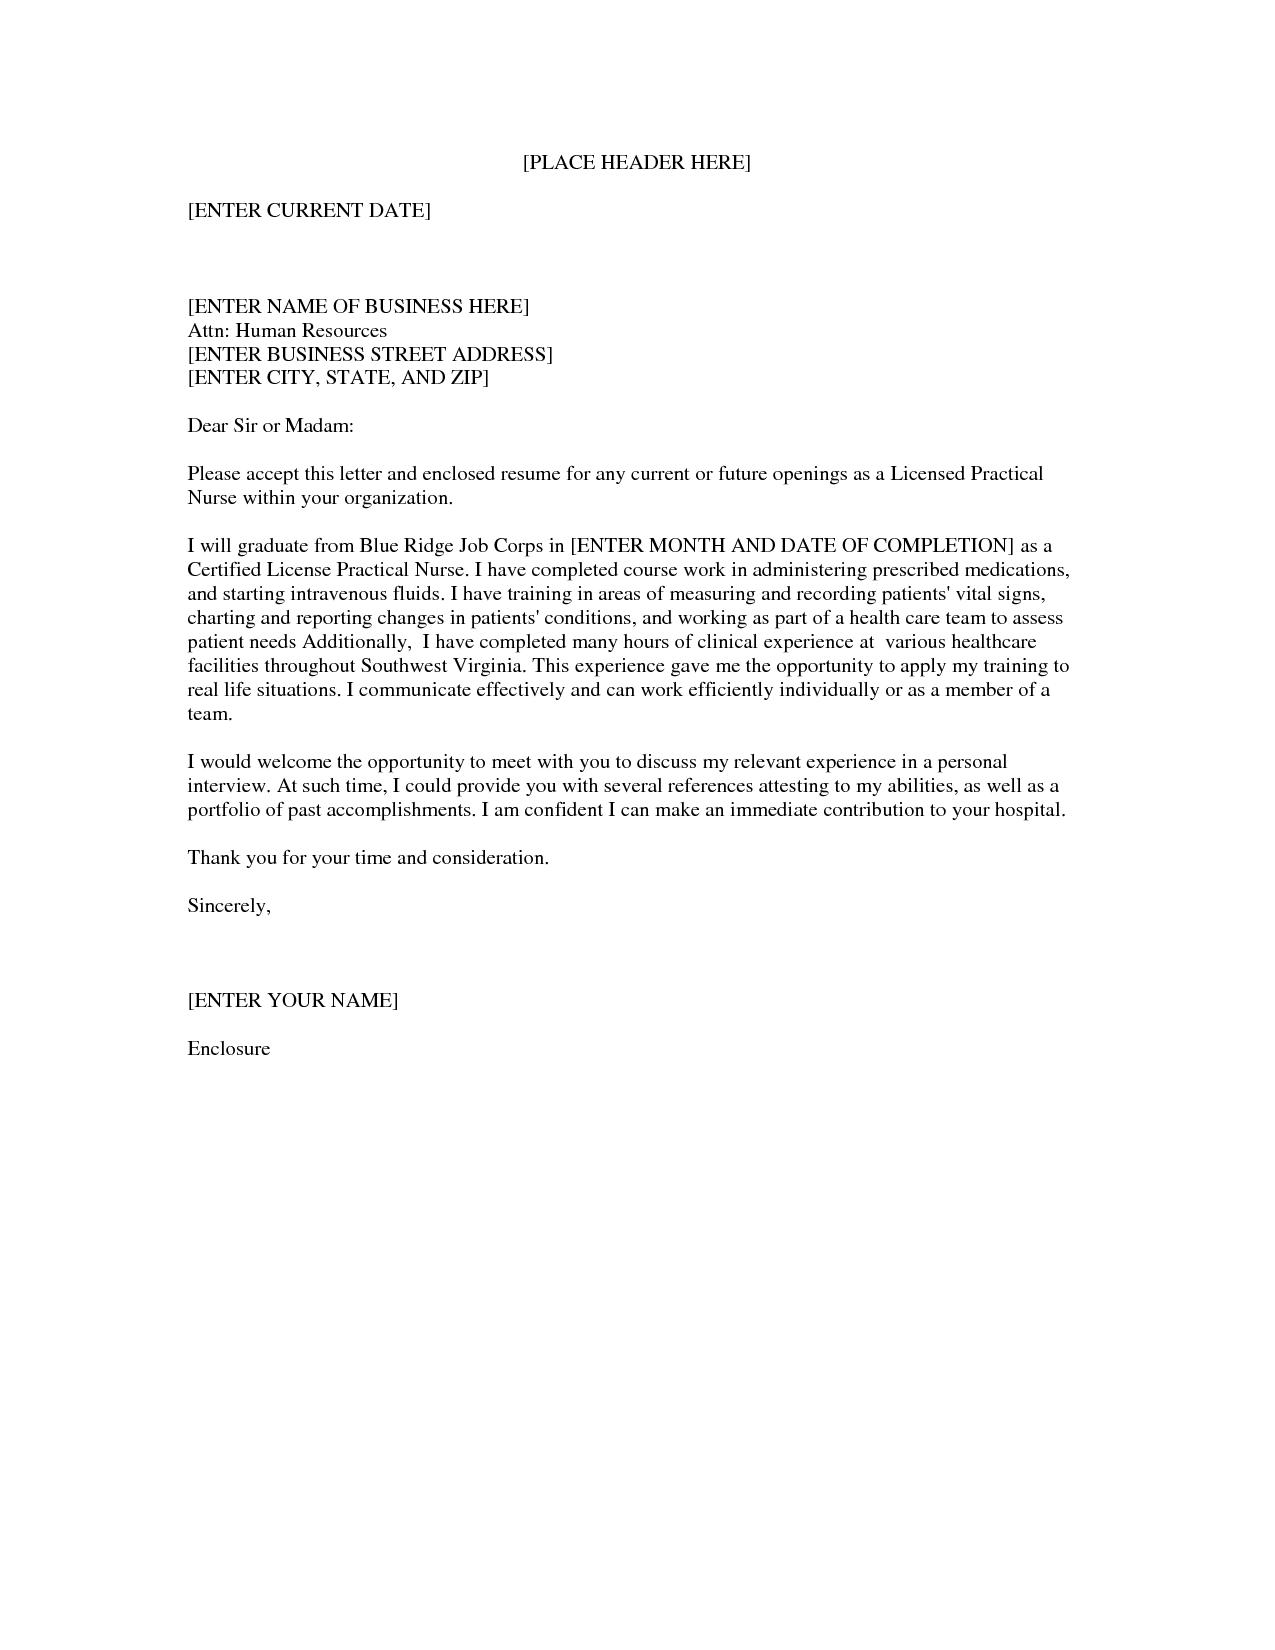 Lpn Nursing Cover Letter Sample Nursing Cover Letter Nurse Cover Cover Letter For Resume